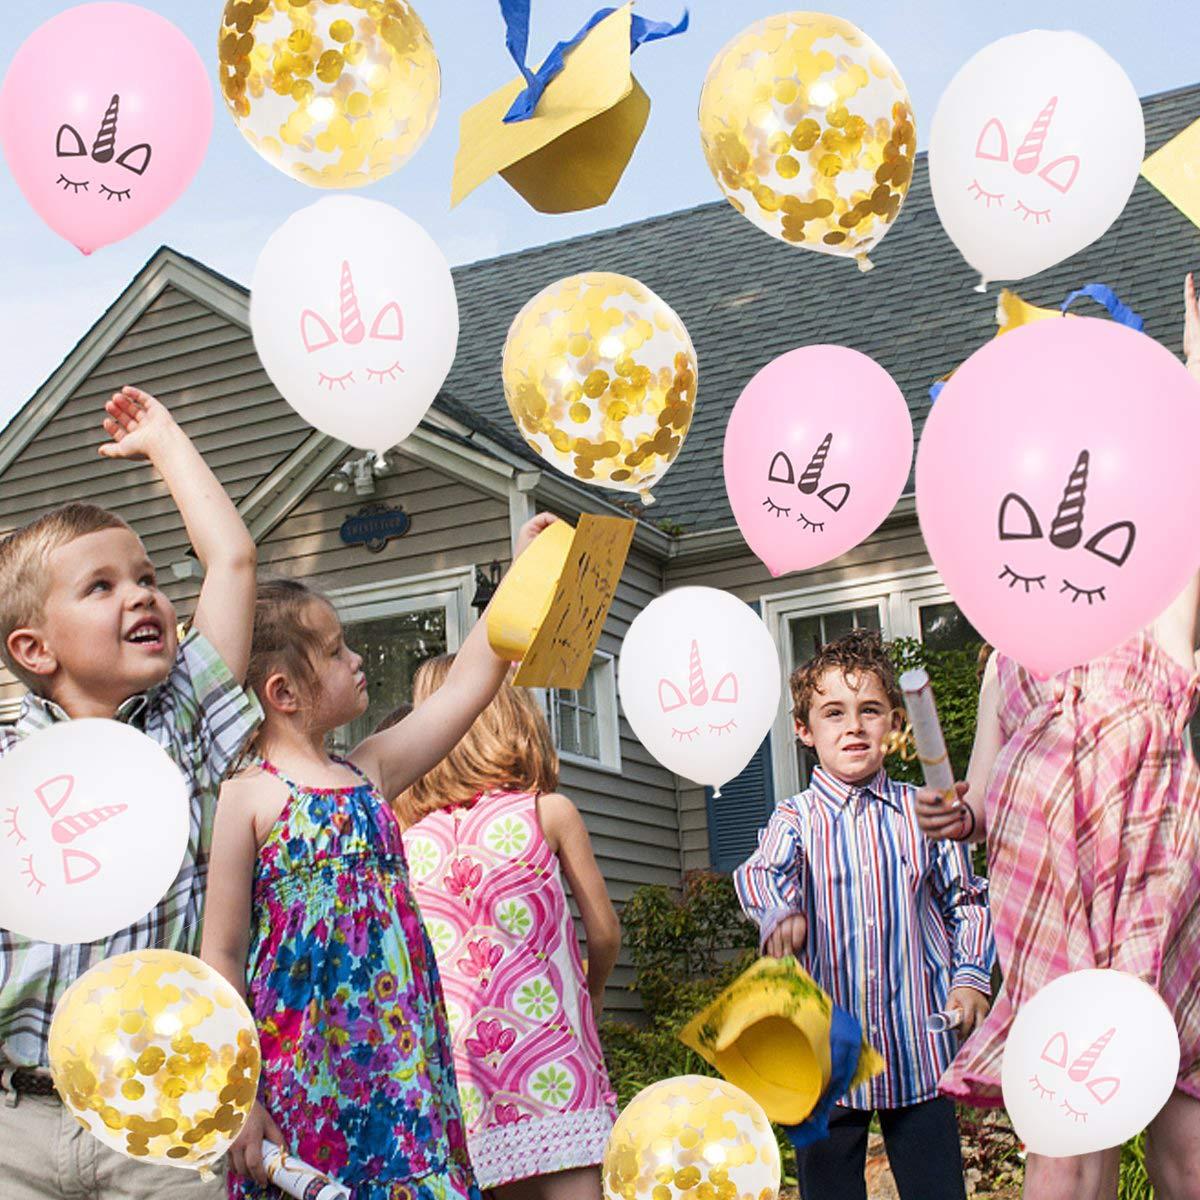 Unicorn Balloons /& Gold Confetti Balloons 15Pcs Unicorn Birthday Party Wedding Baby Shower Decoration EASTiii